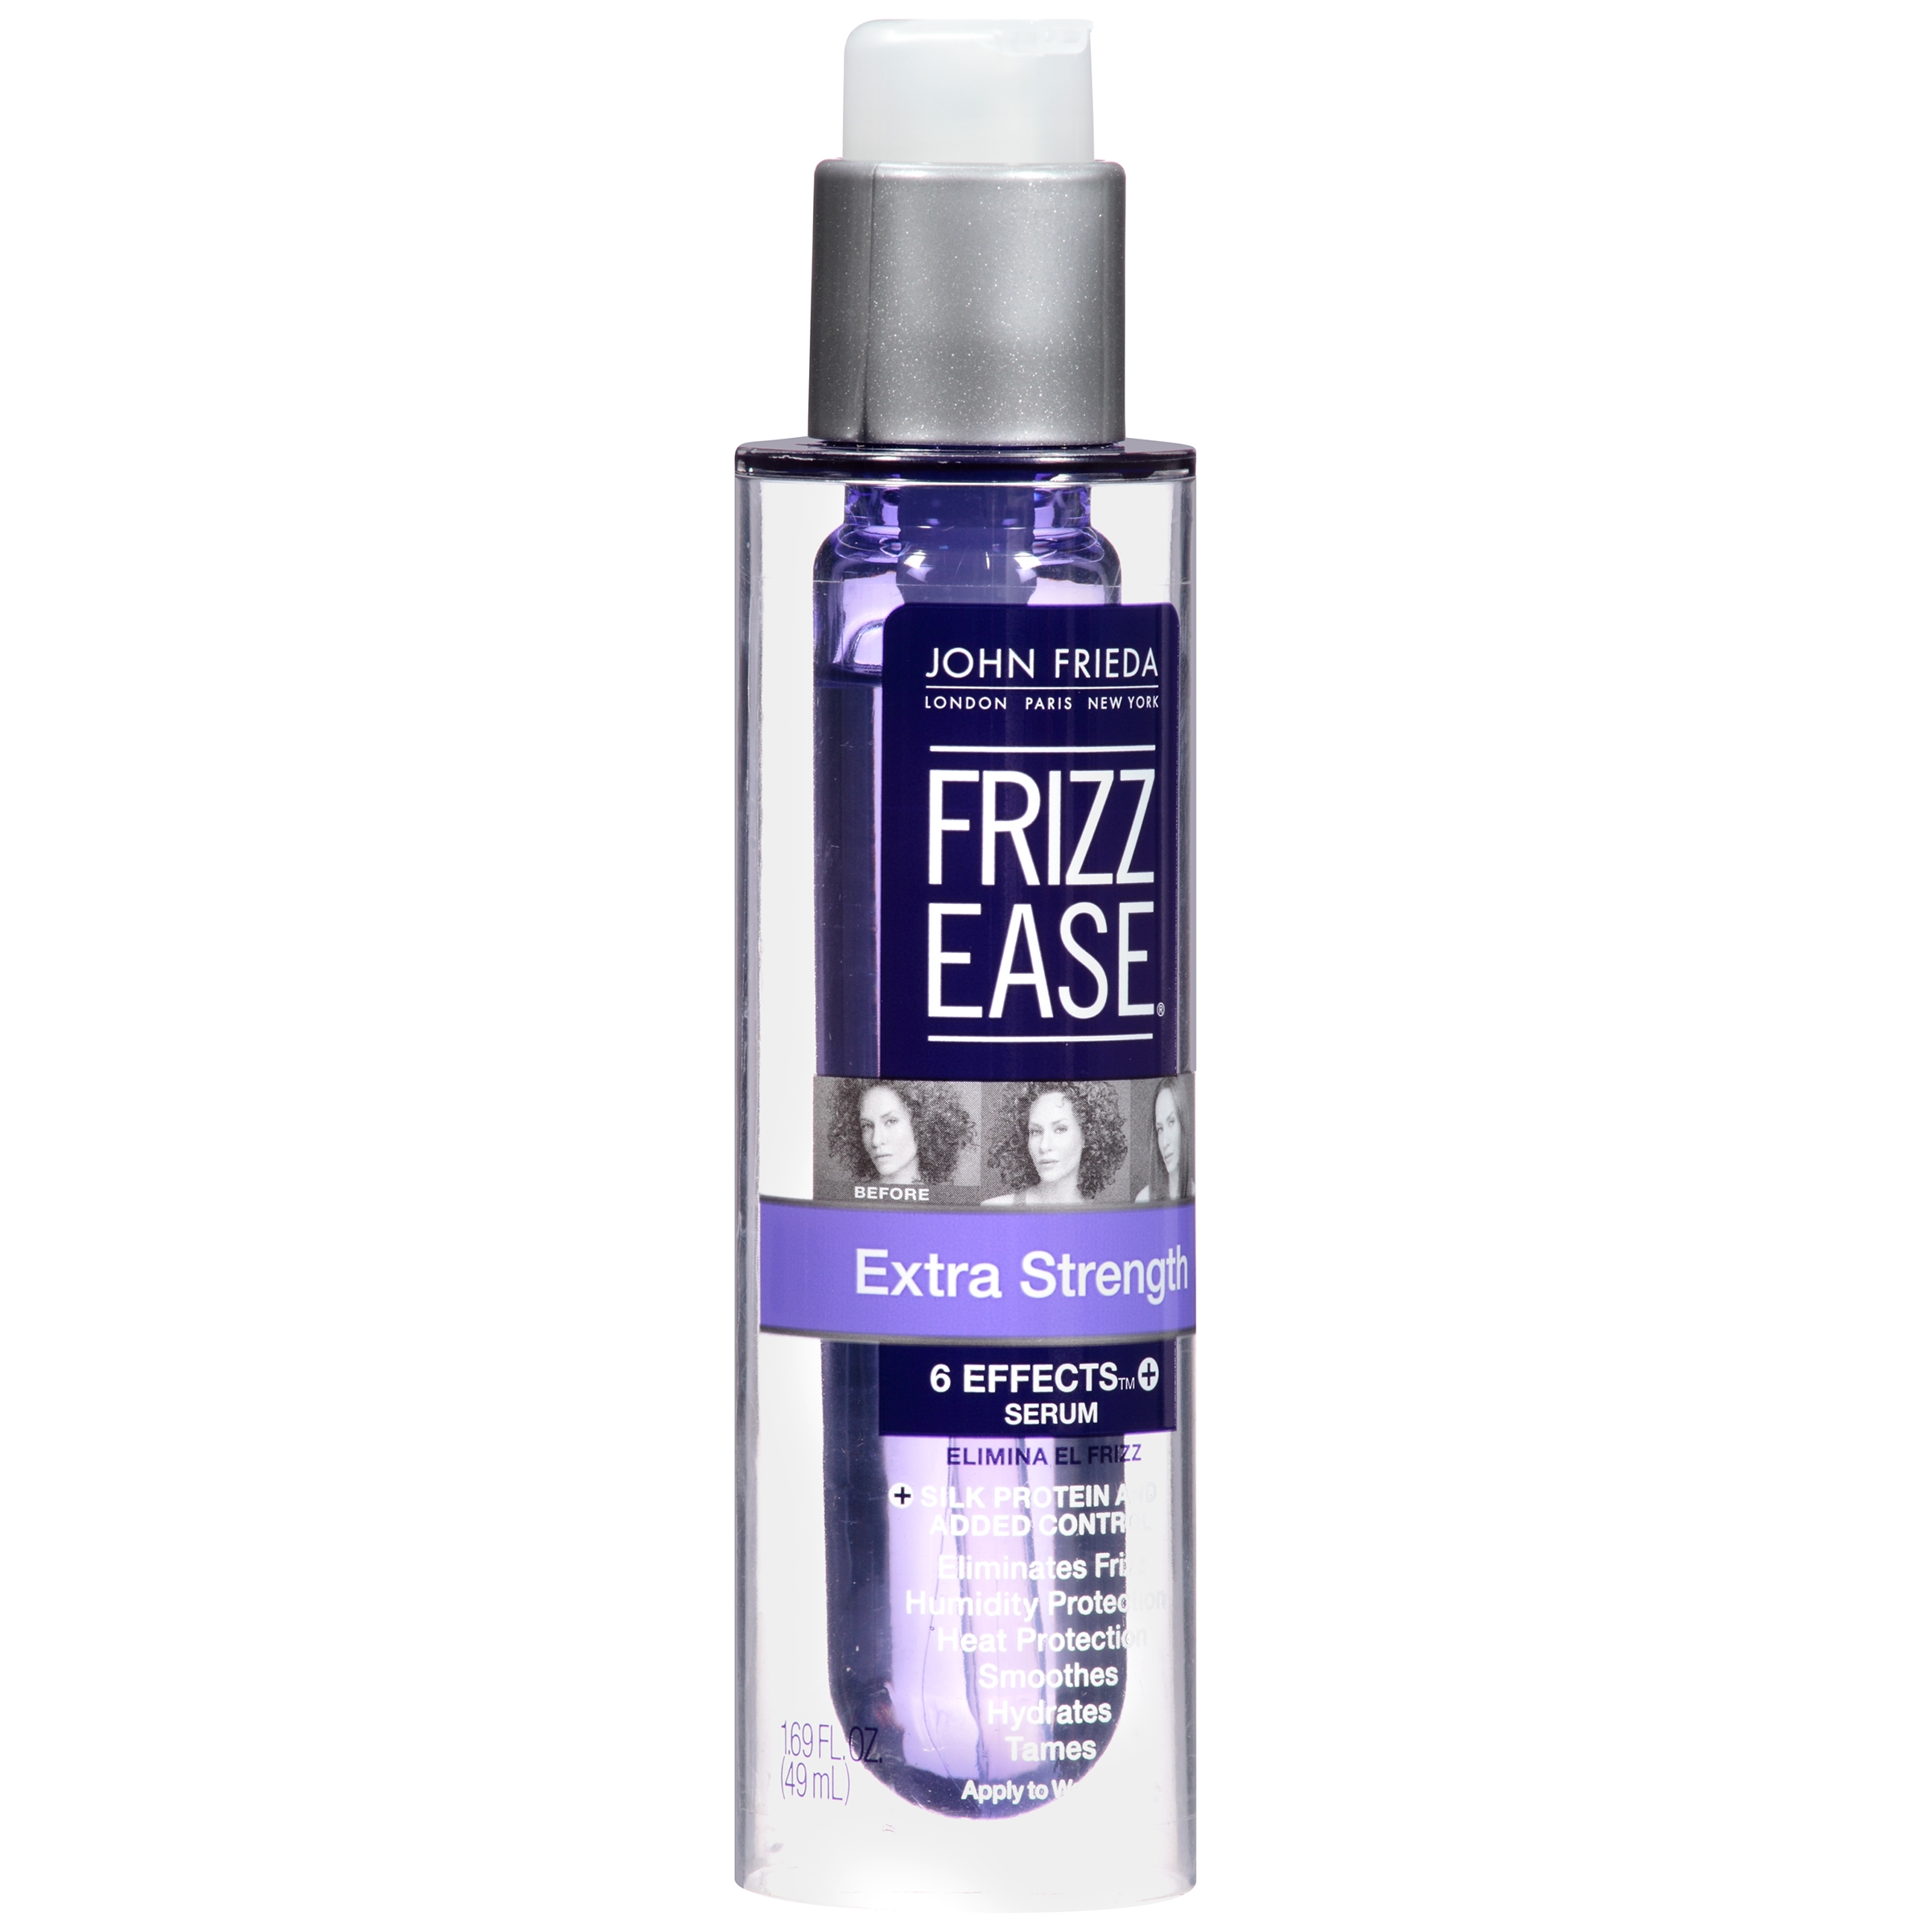 John Frieda Frizz Ease Extra Strength Effects Serum, 1.69 FL OZ